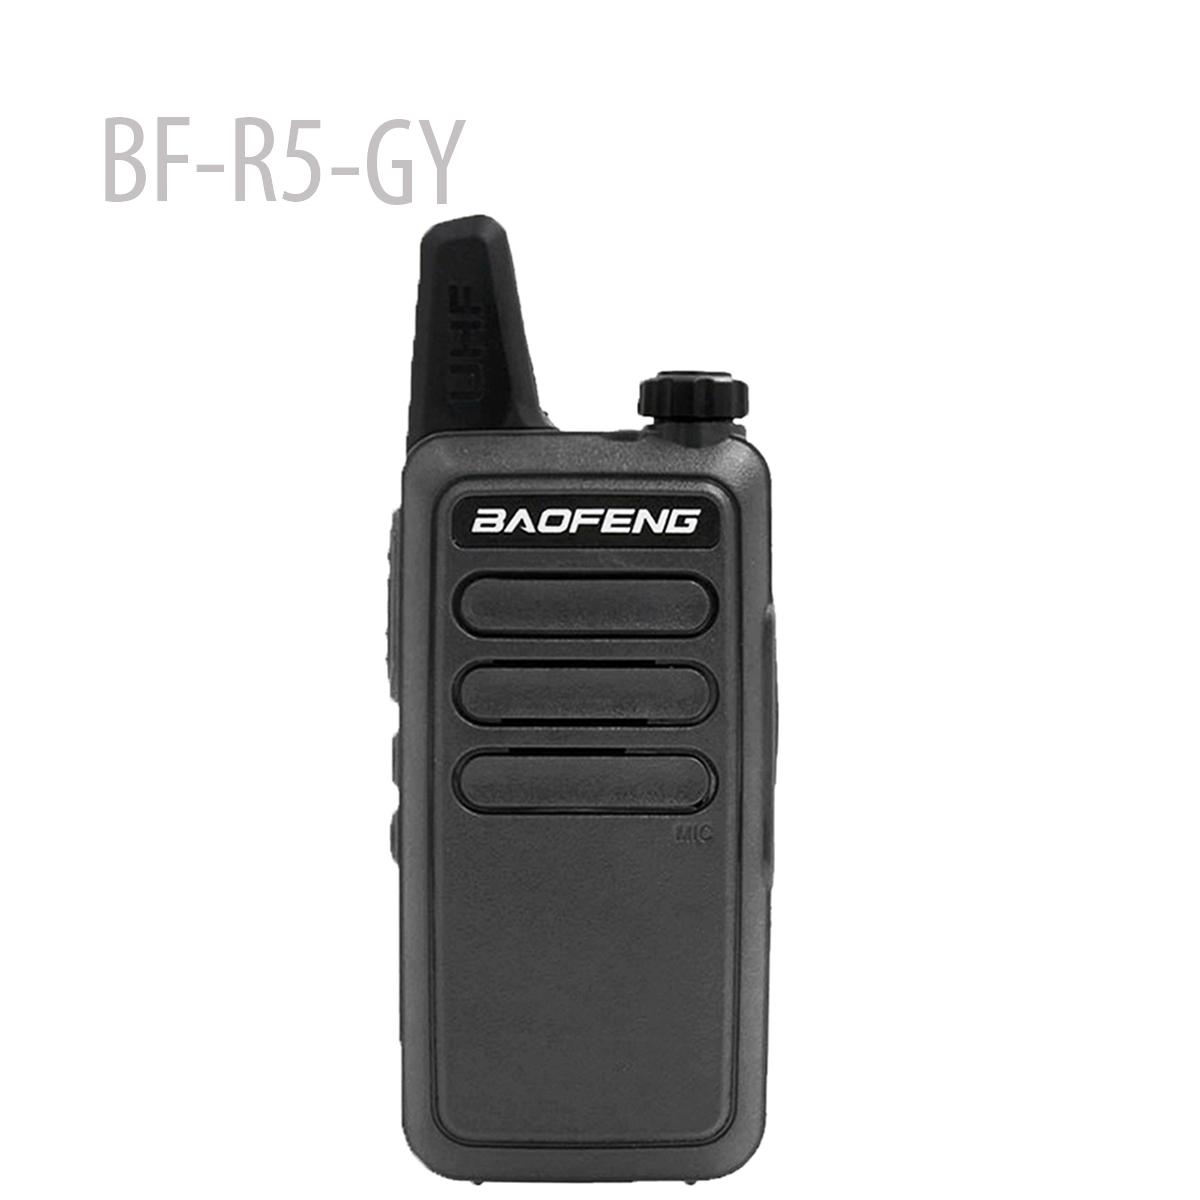 BAOFENG BF-R5-GY Mini Portable two way radio UHF 400-470MHz